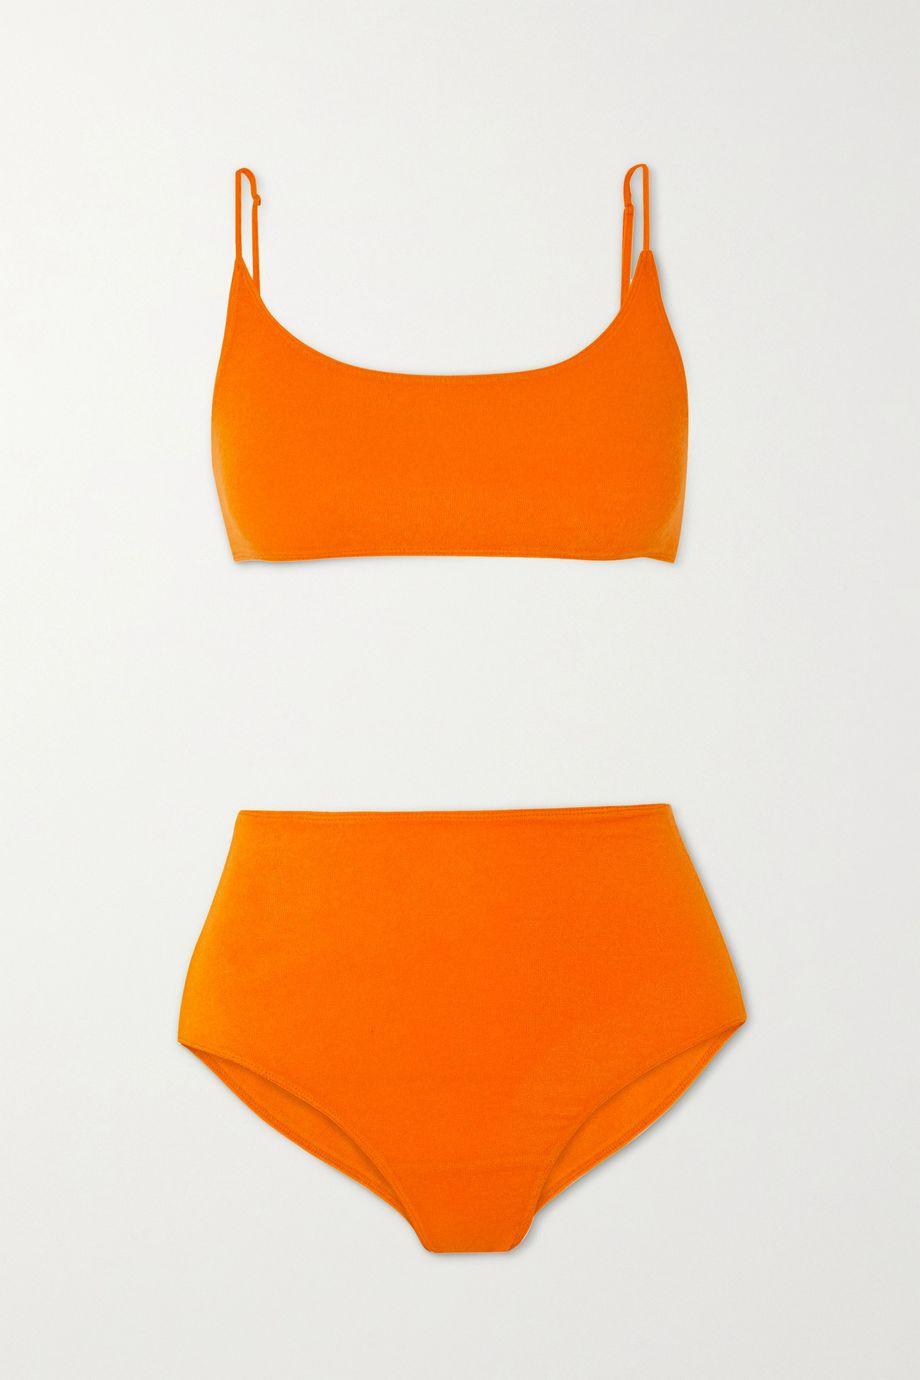 REJINA PYO + NET SUSTAIN Imogen jersey bikini